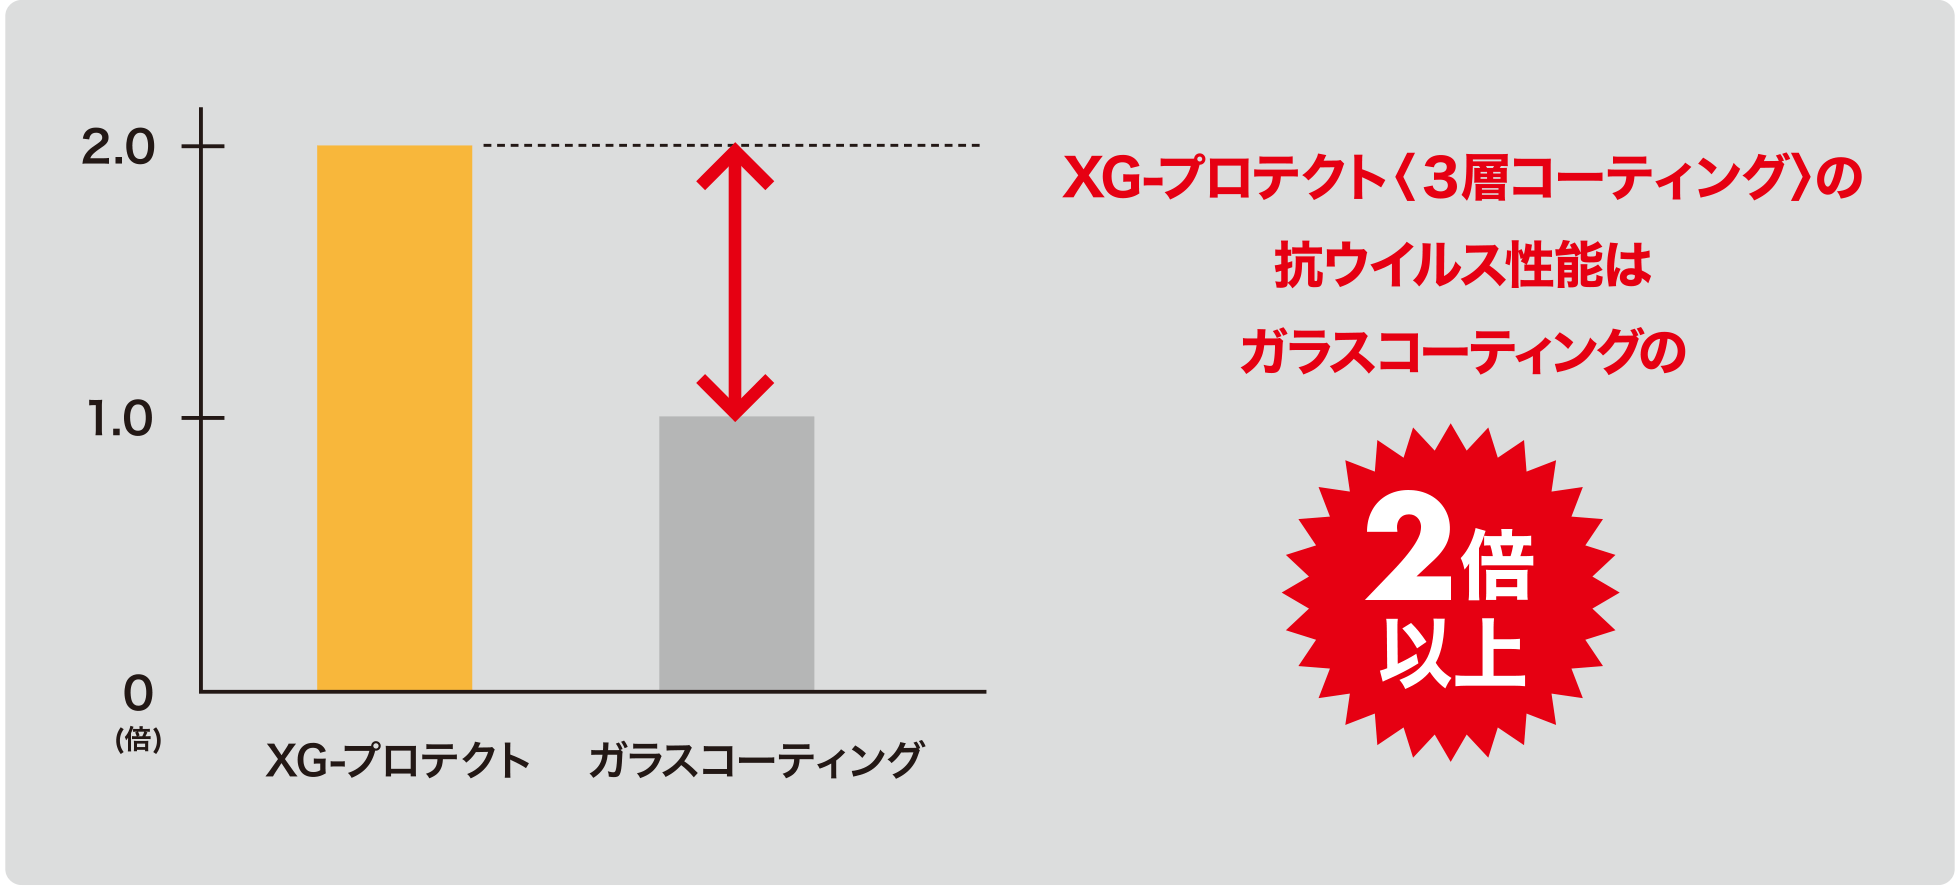 XG-プロテクトは、ガラスコーティングの2倍以上強力!図